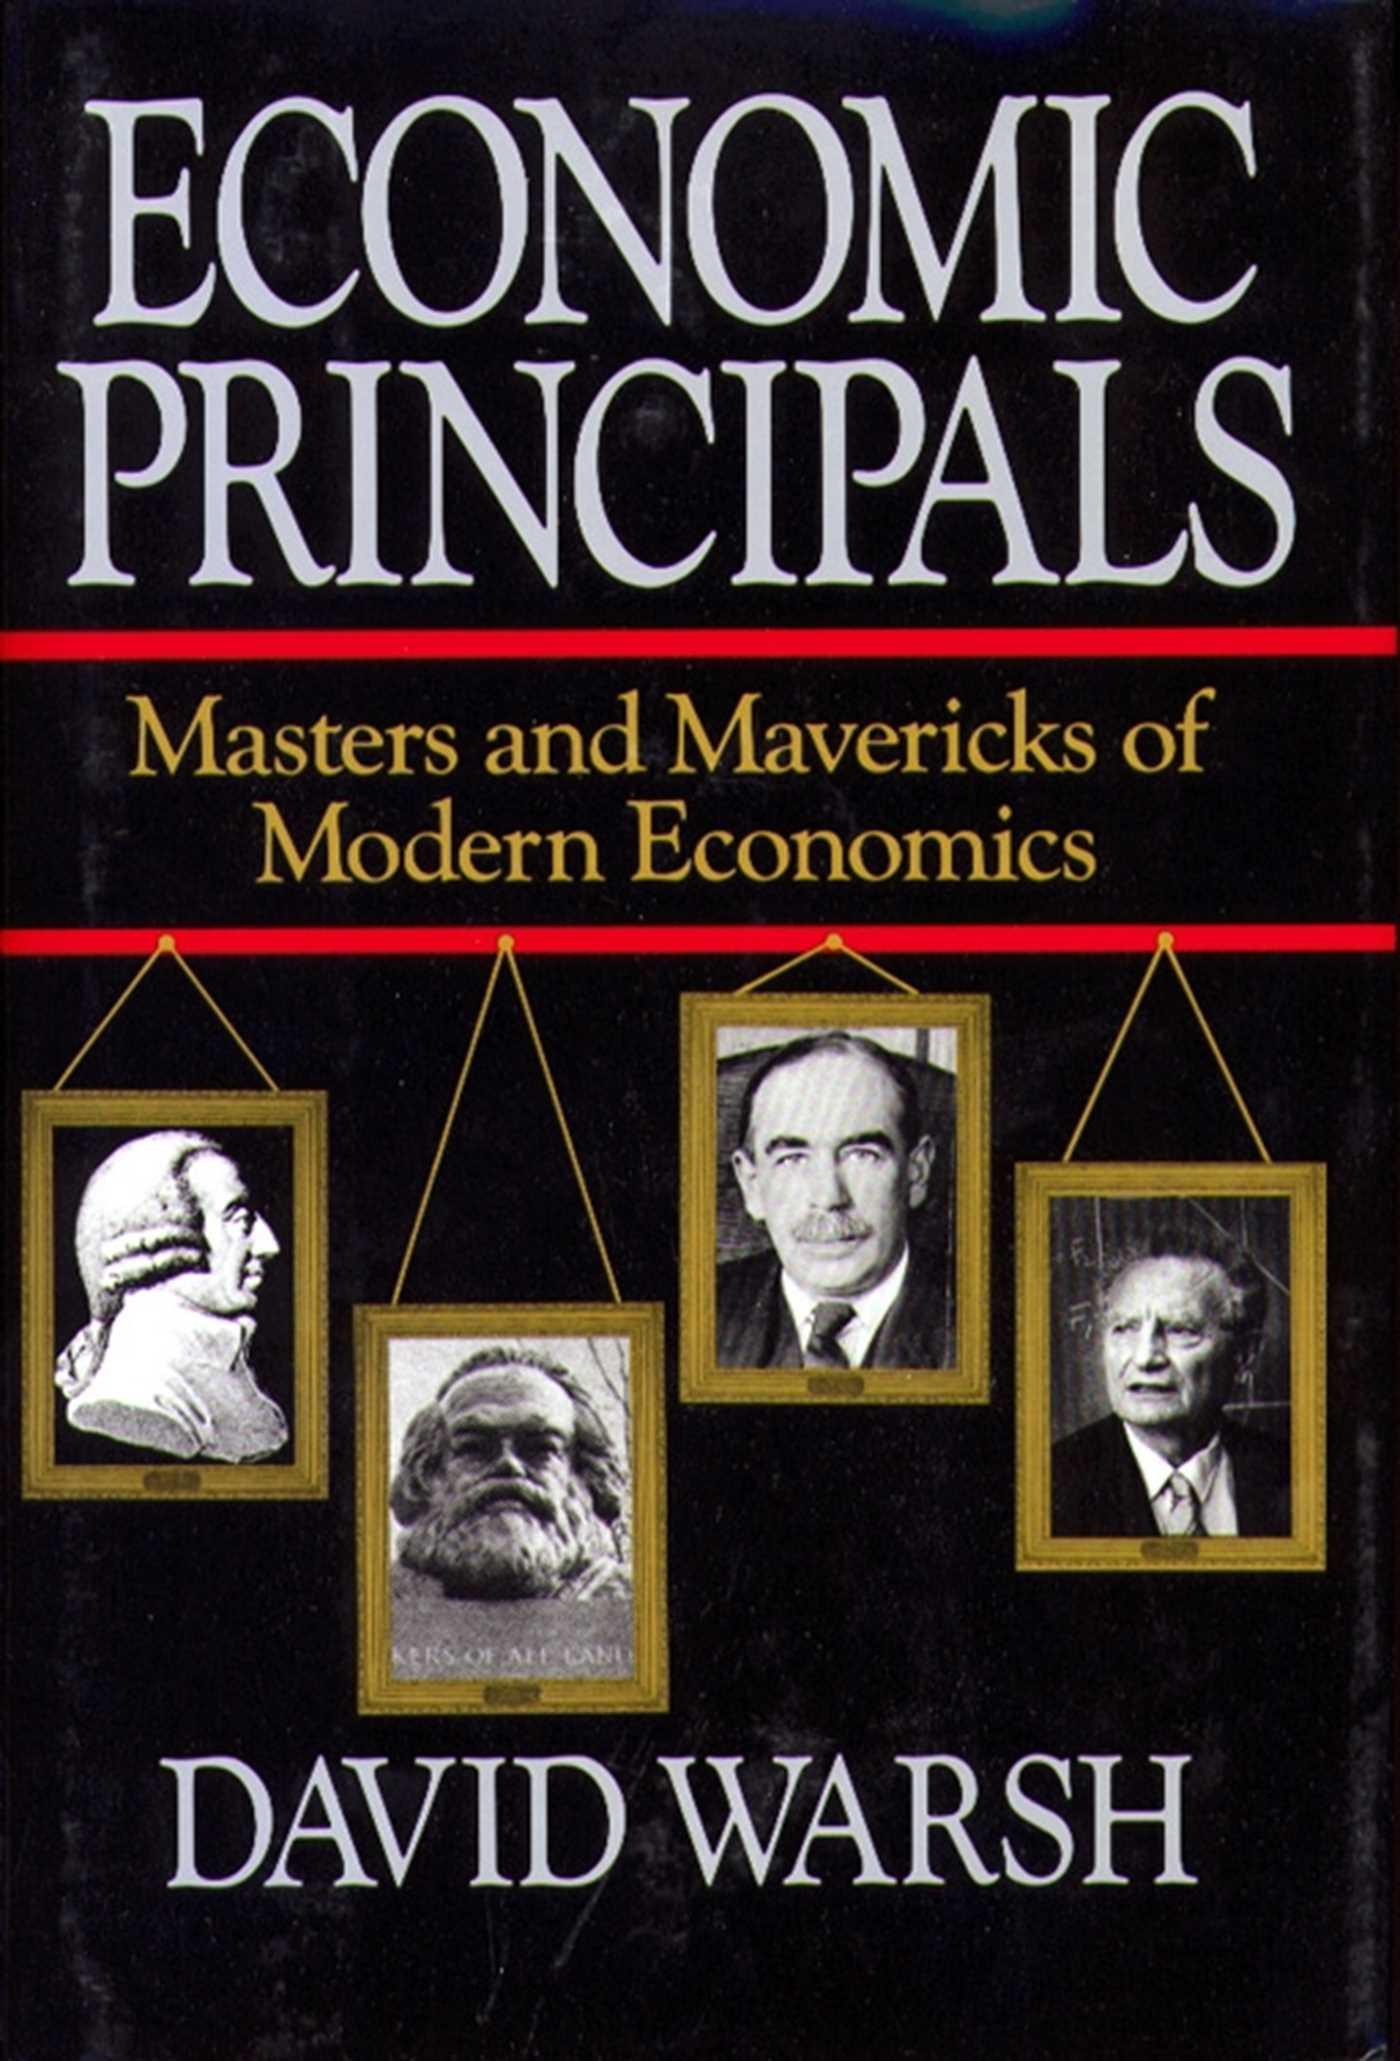 Economic principles 9781451602562 hr